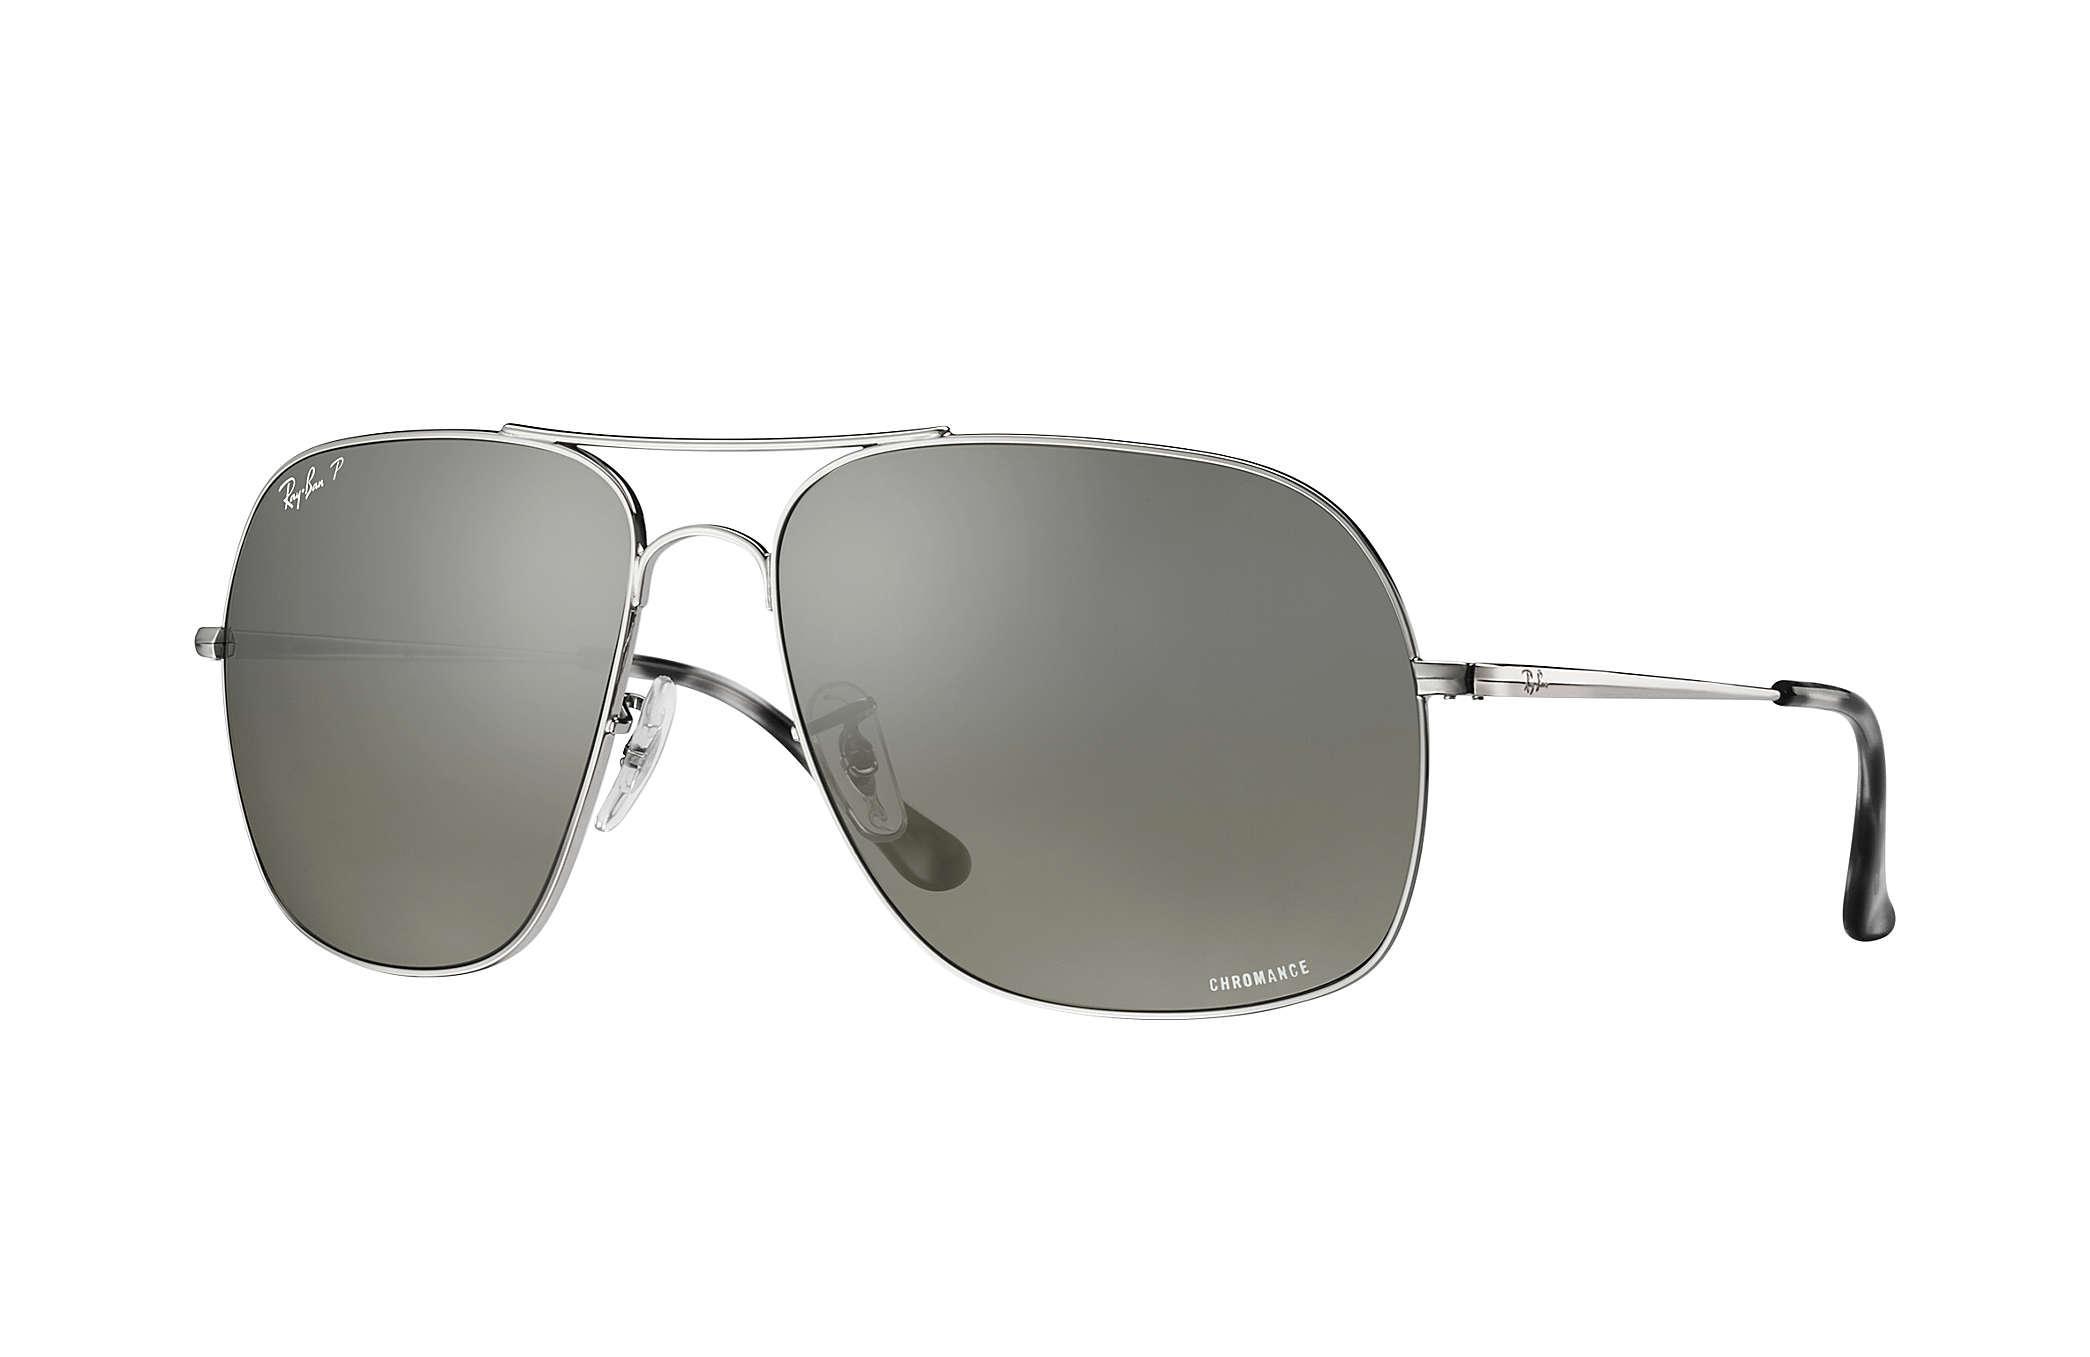 8926e803b031 release date ray ban rb3543 chromance sunglasses a3b72 03575; spain ray ban.  mens metallic rb3587 chromance 62a60 f0009